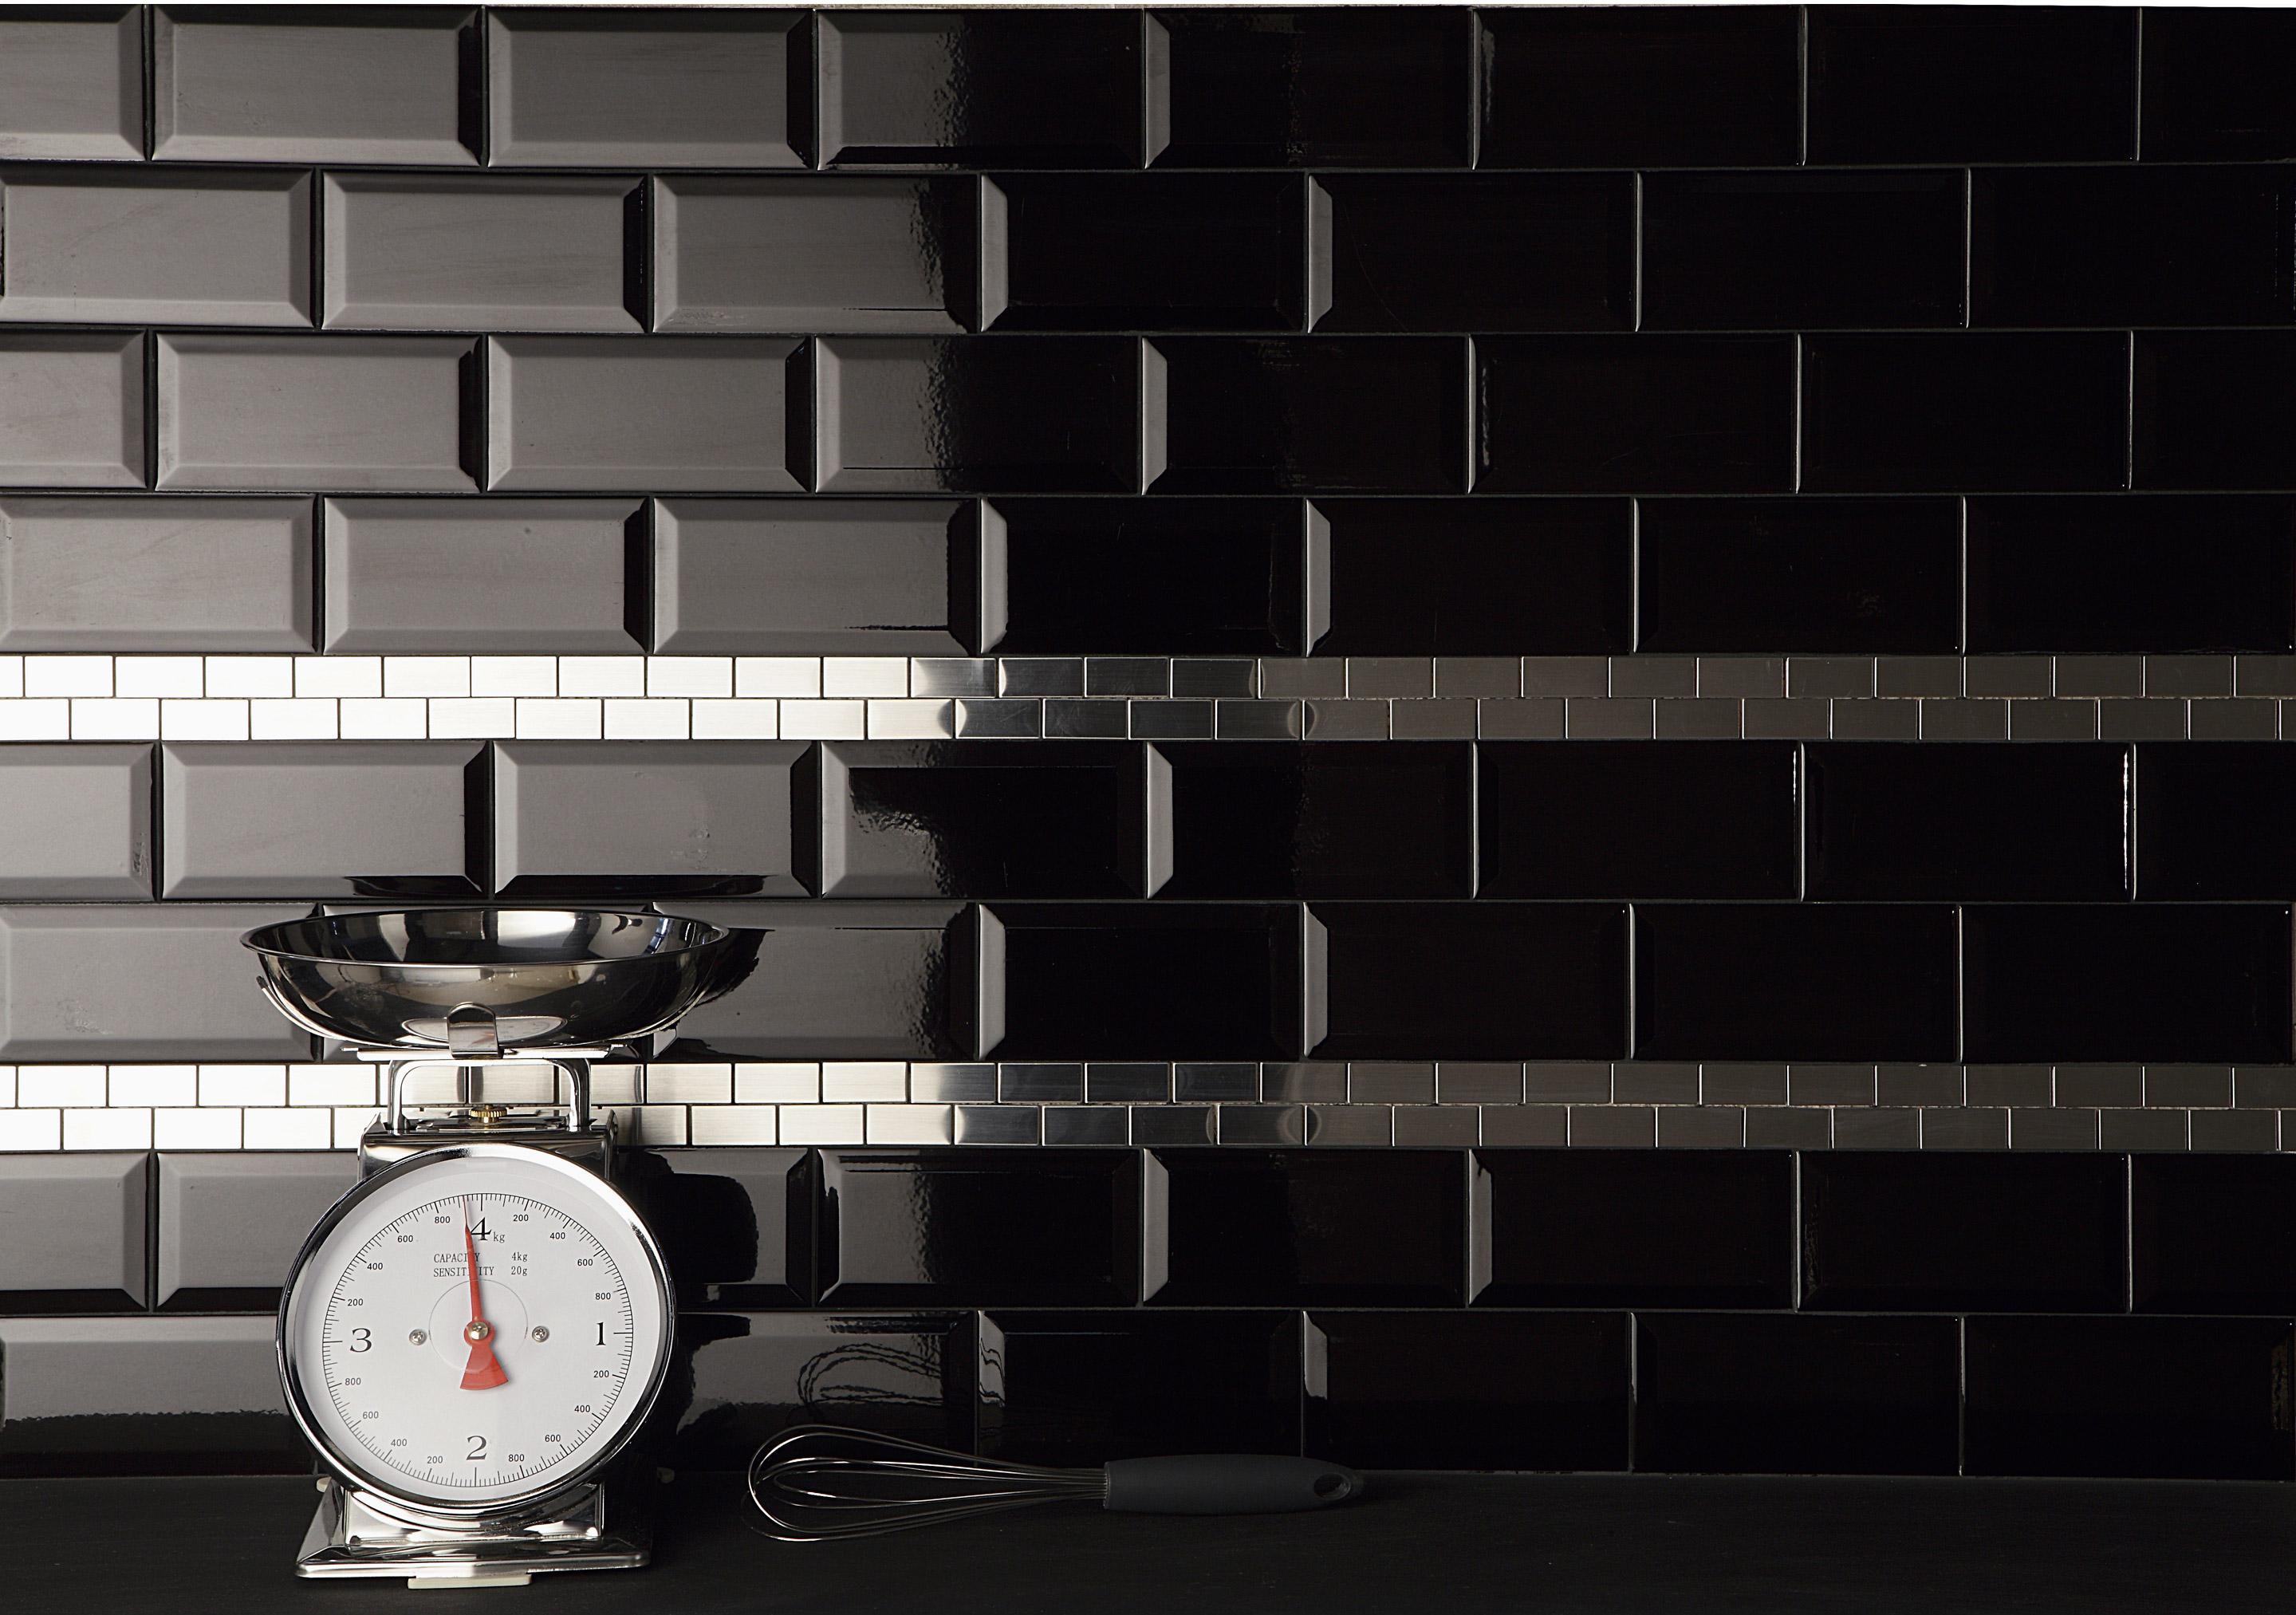 Carrelage mur uni noir brillante l.7.5 x L.15 cm, Metro